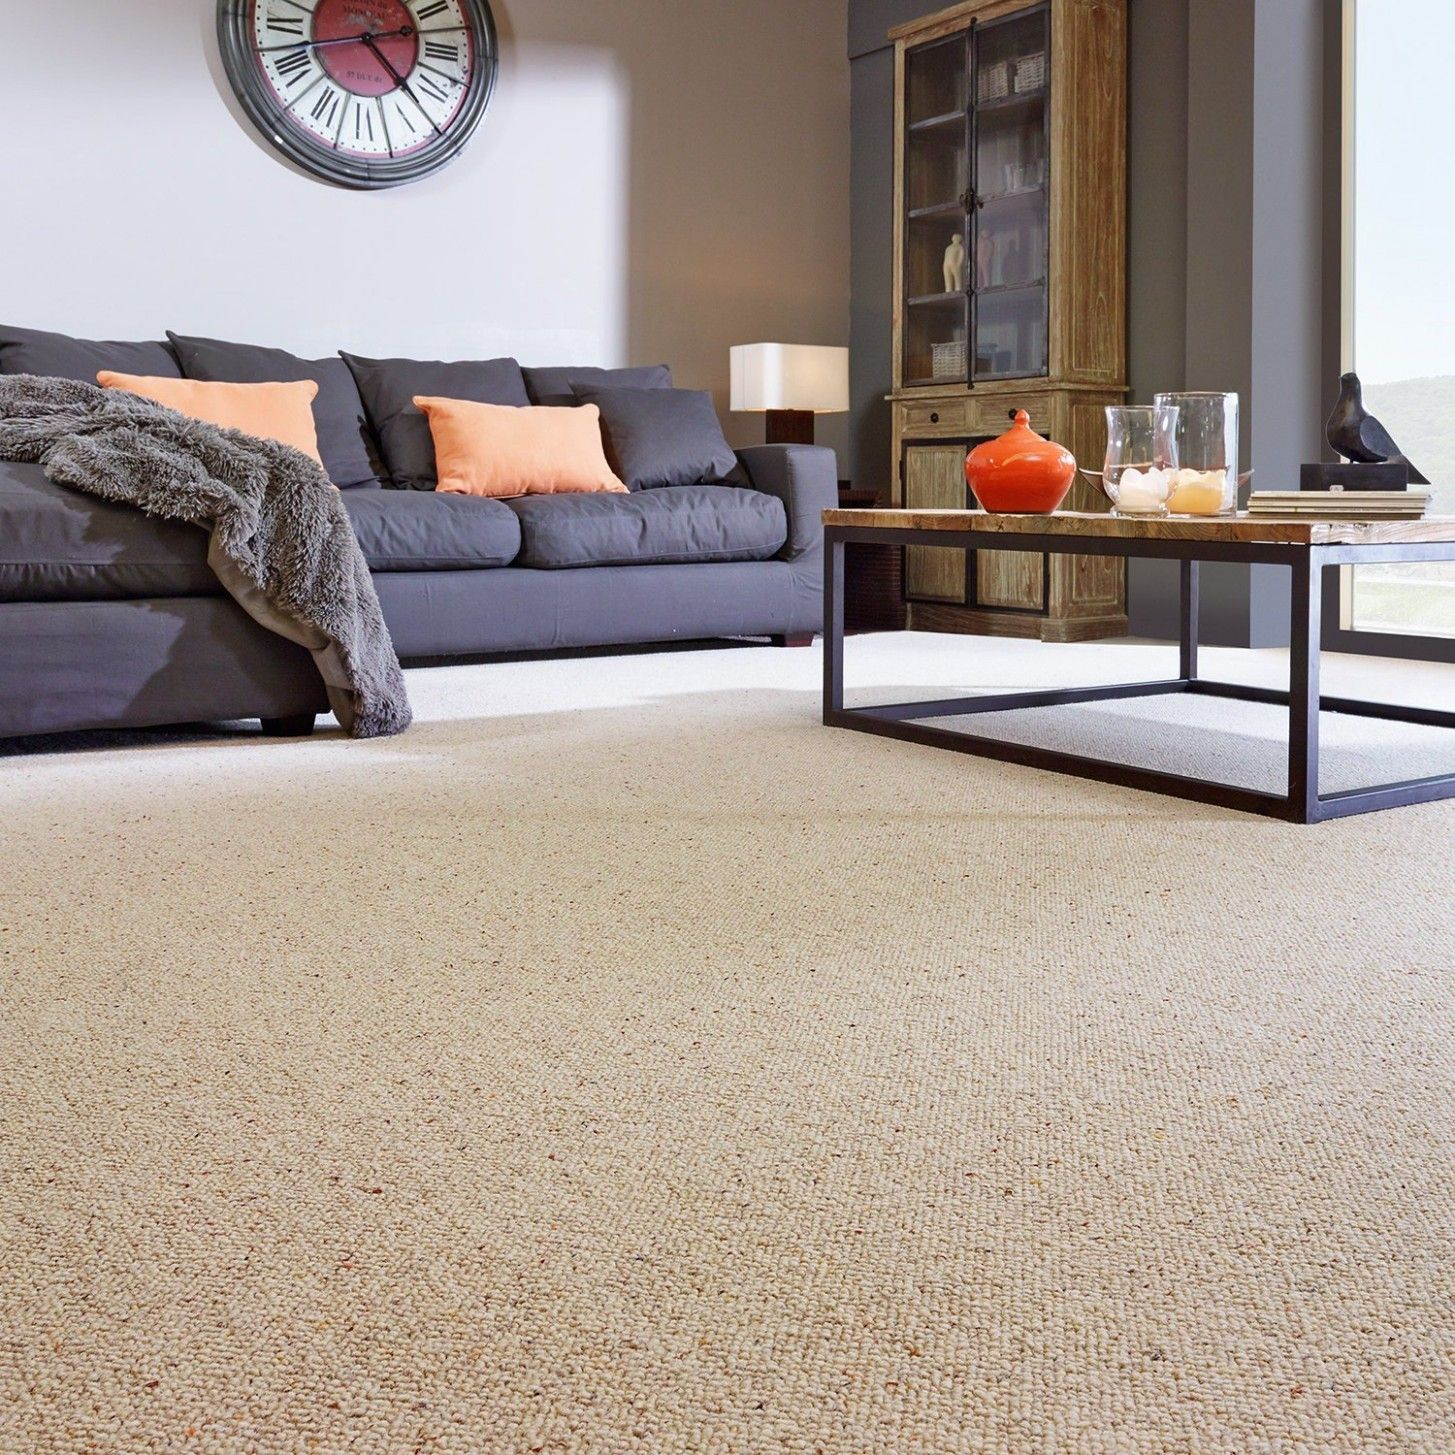 20 Stylish Lounge Room Carpet Ideas, Carpet Styles For Living Room